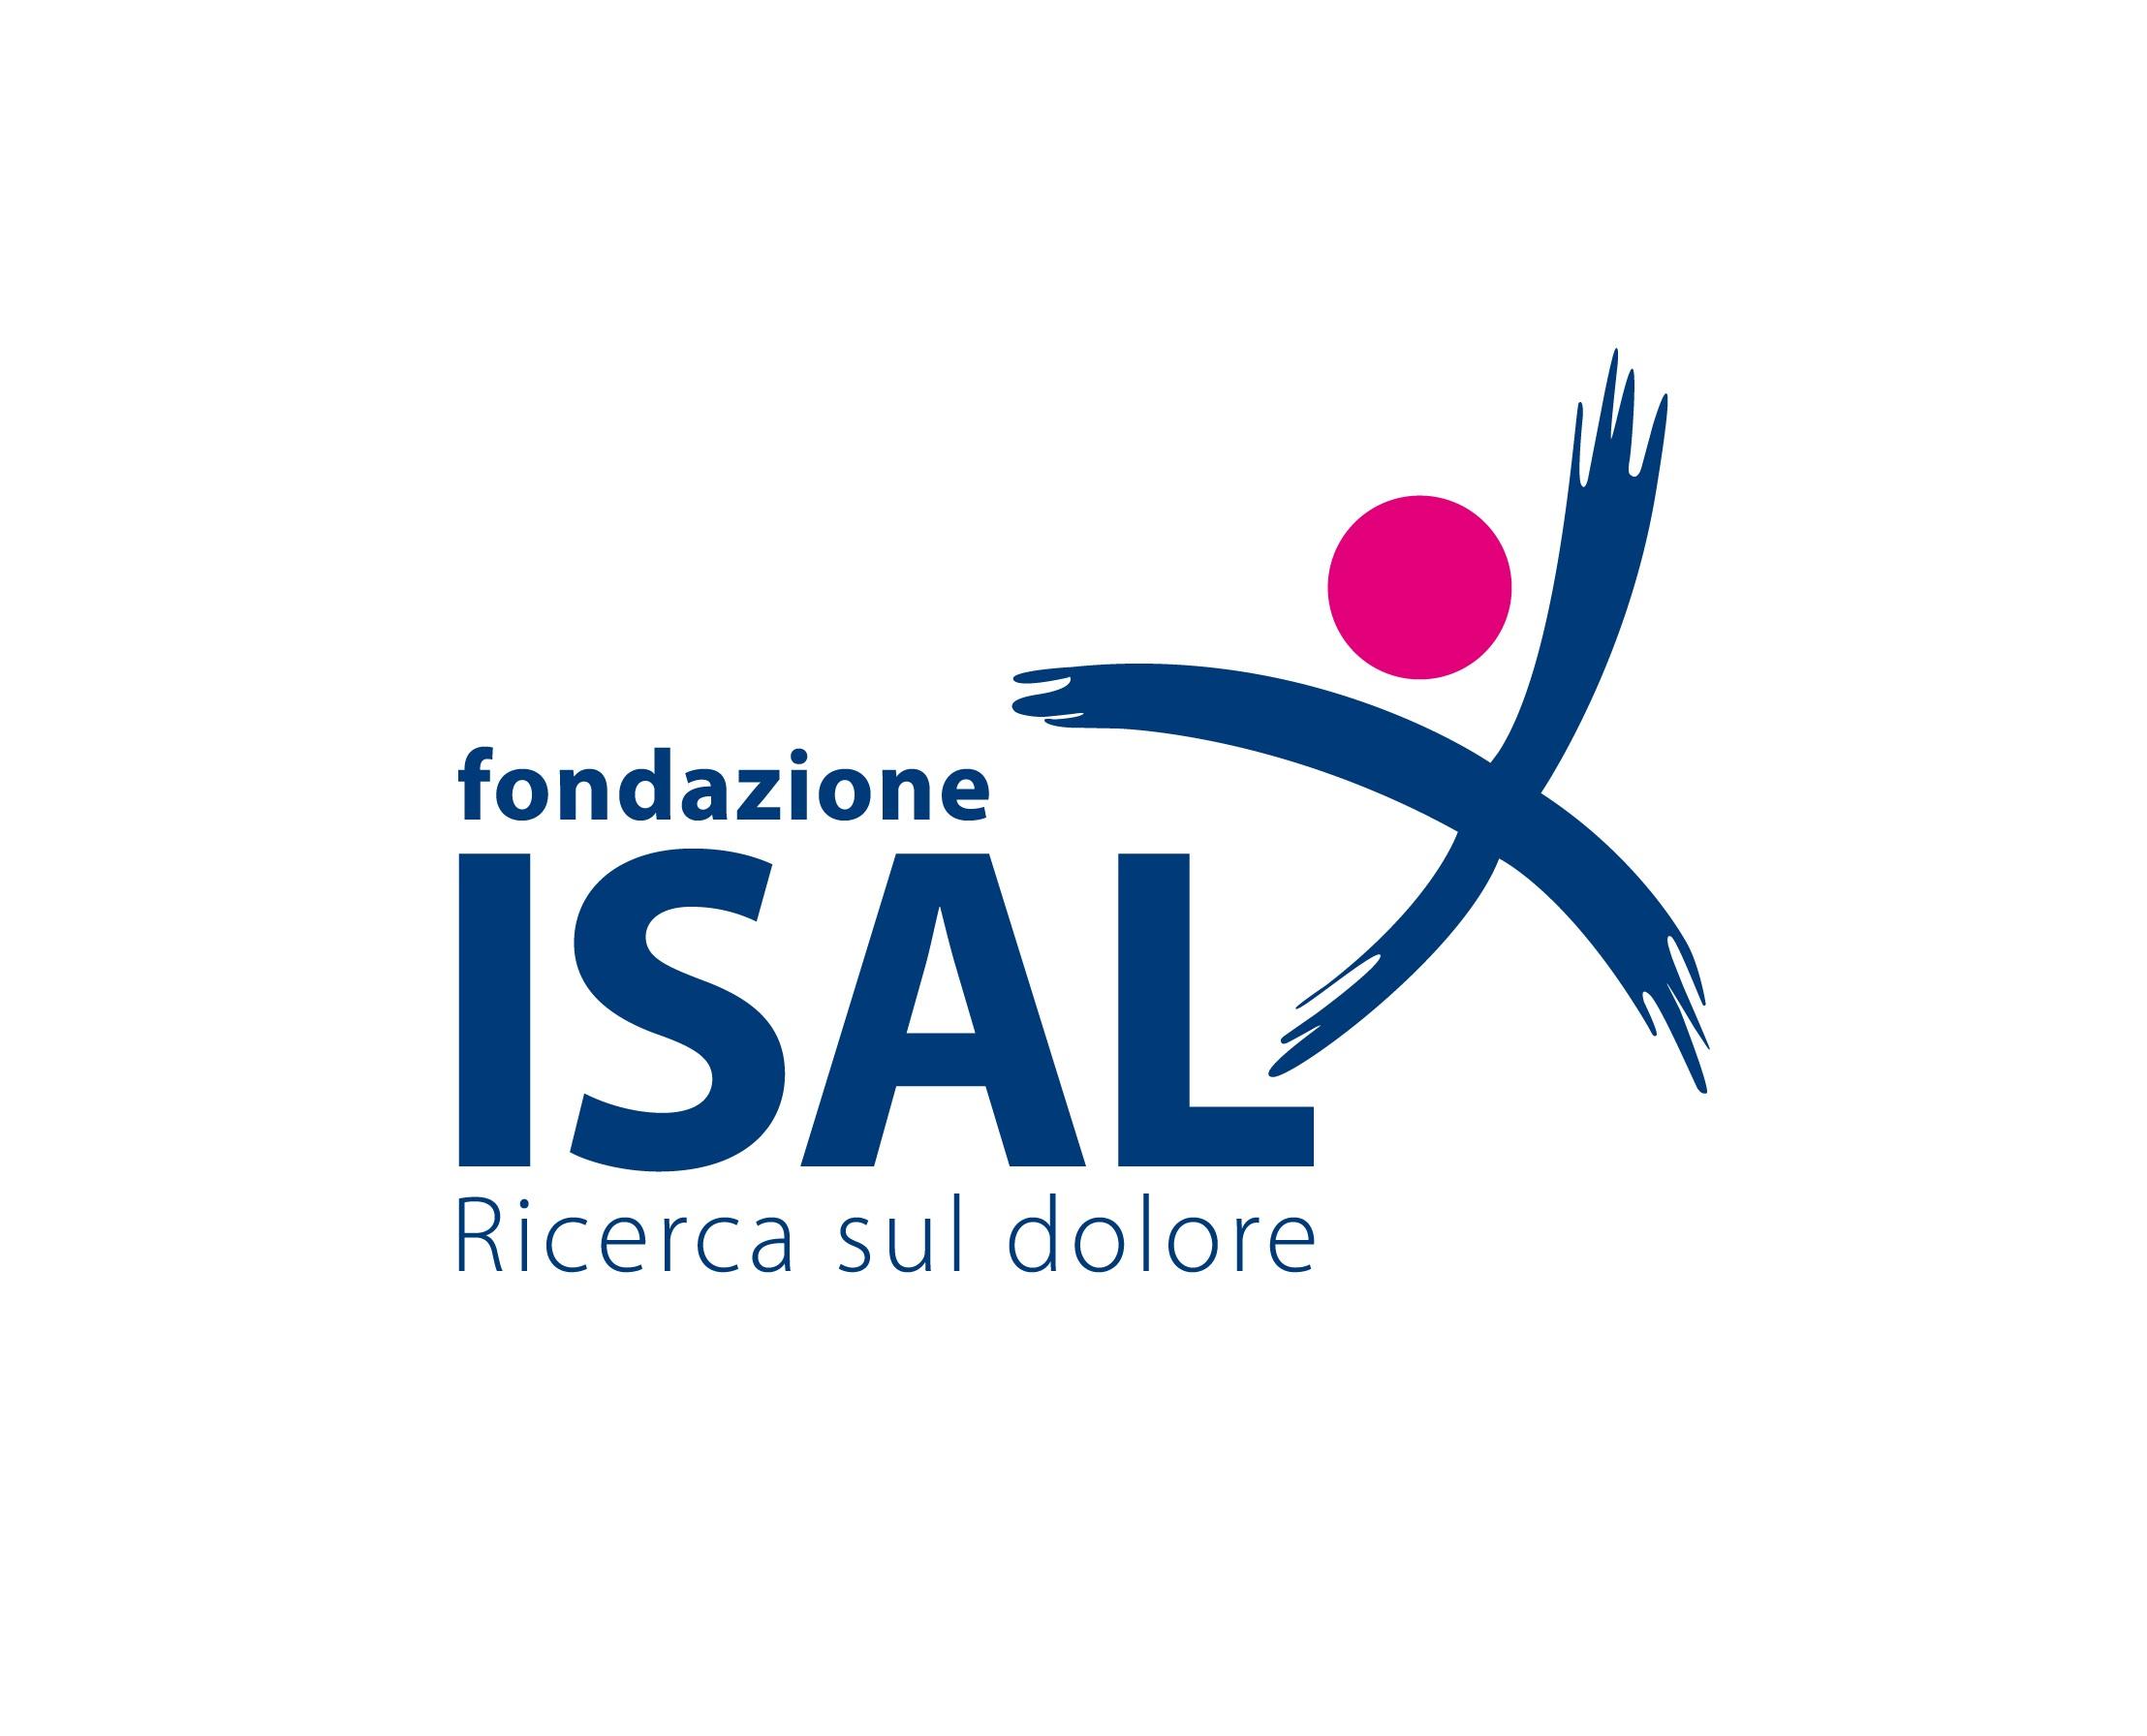 ISAL fondazione